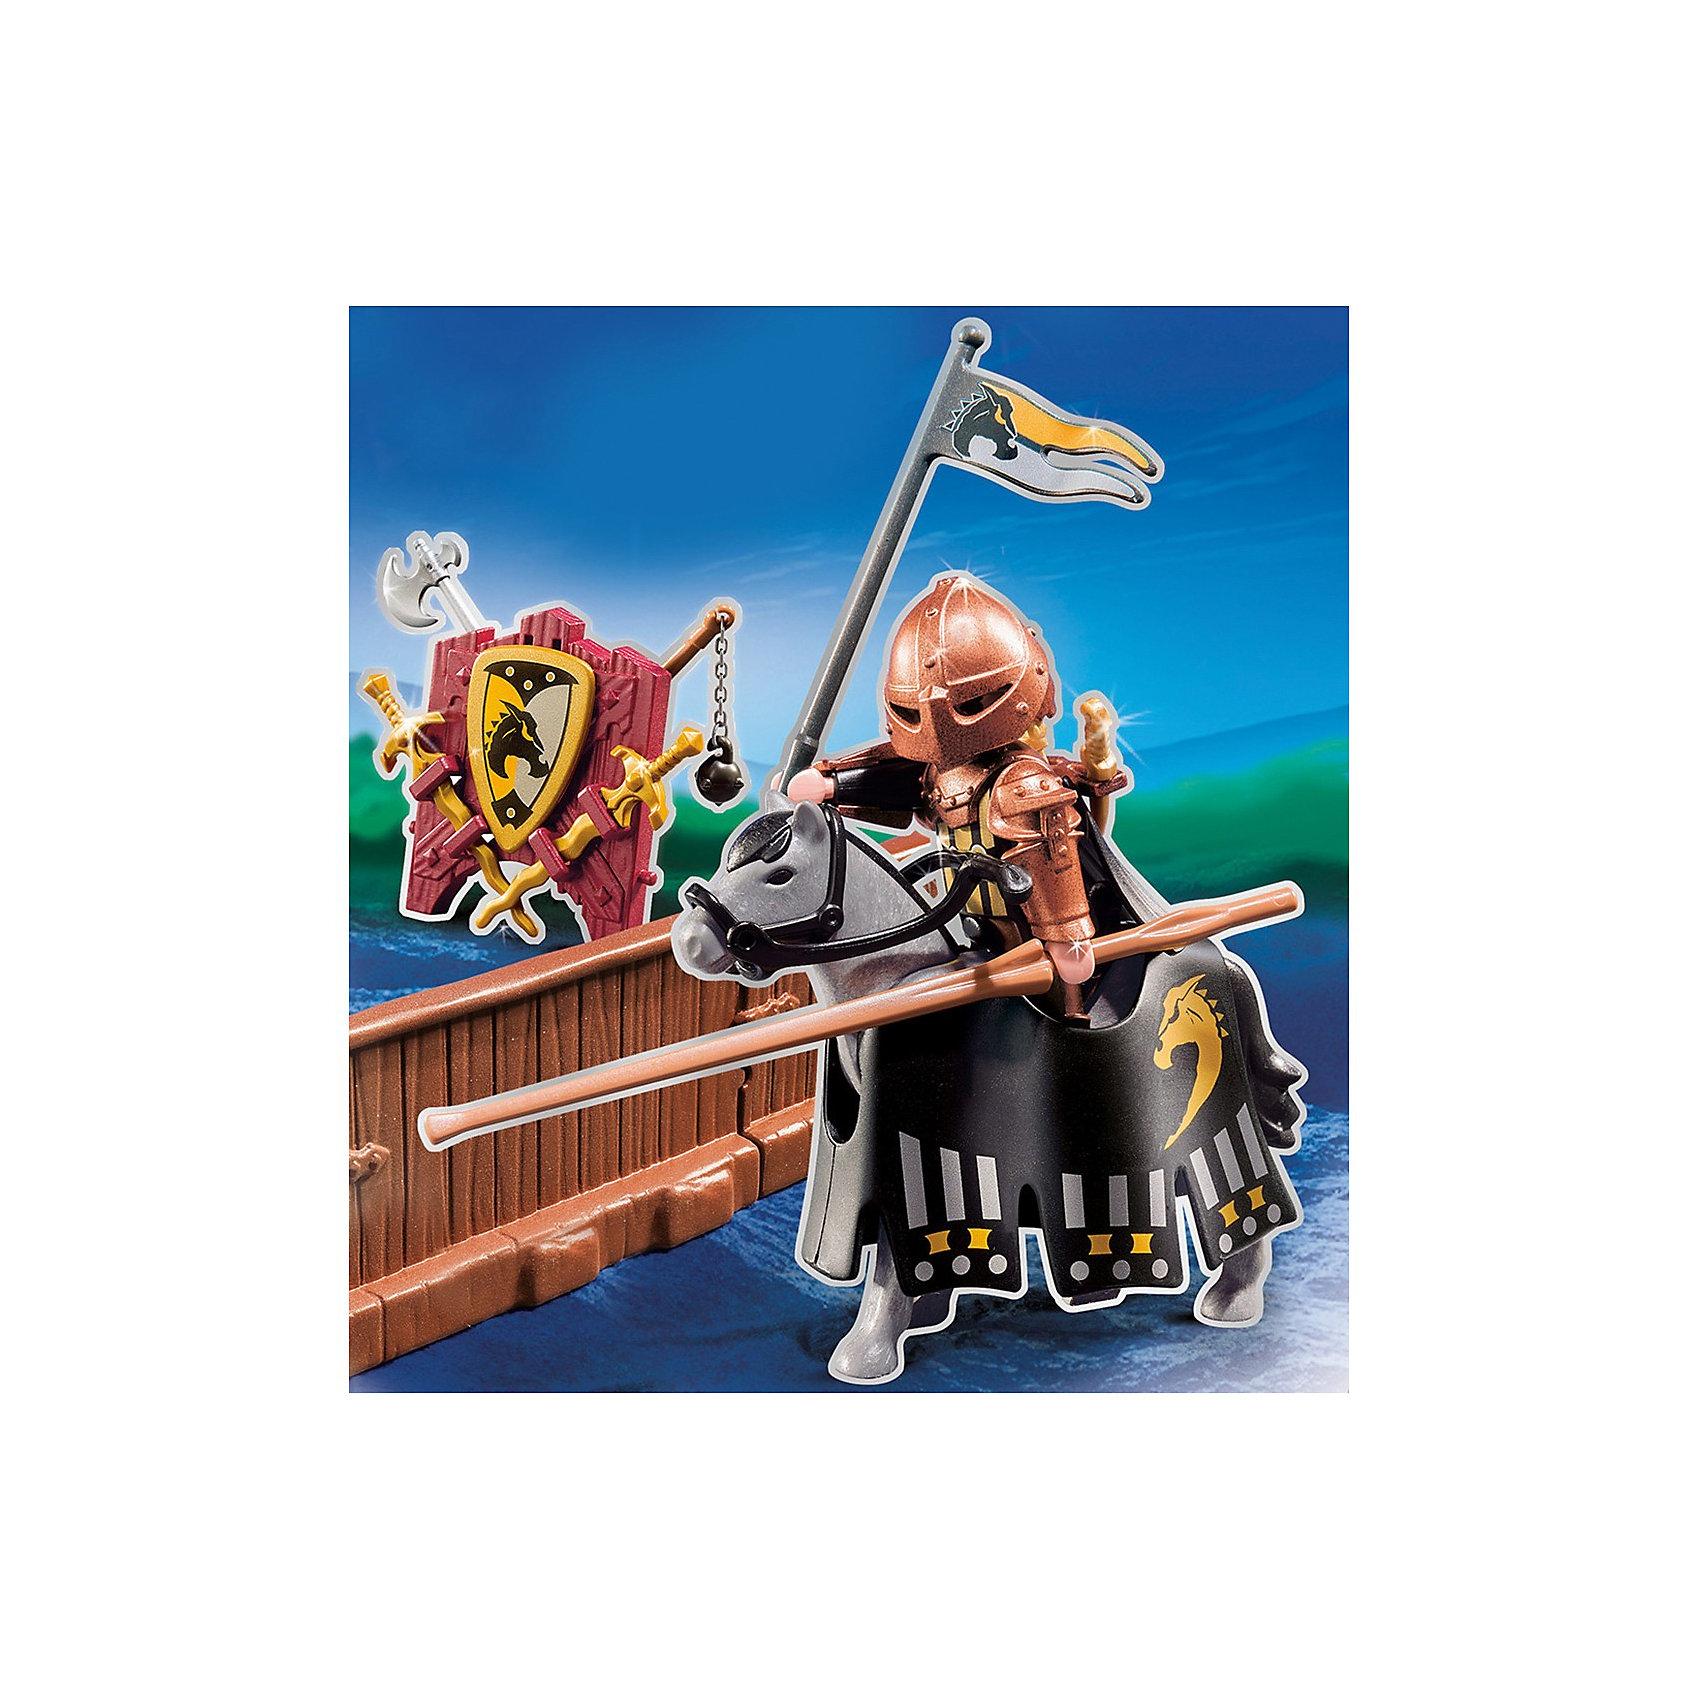 PLAYMOBIL 5357 Рыцари: Турнир рыцаря ордена Дикого скакуна